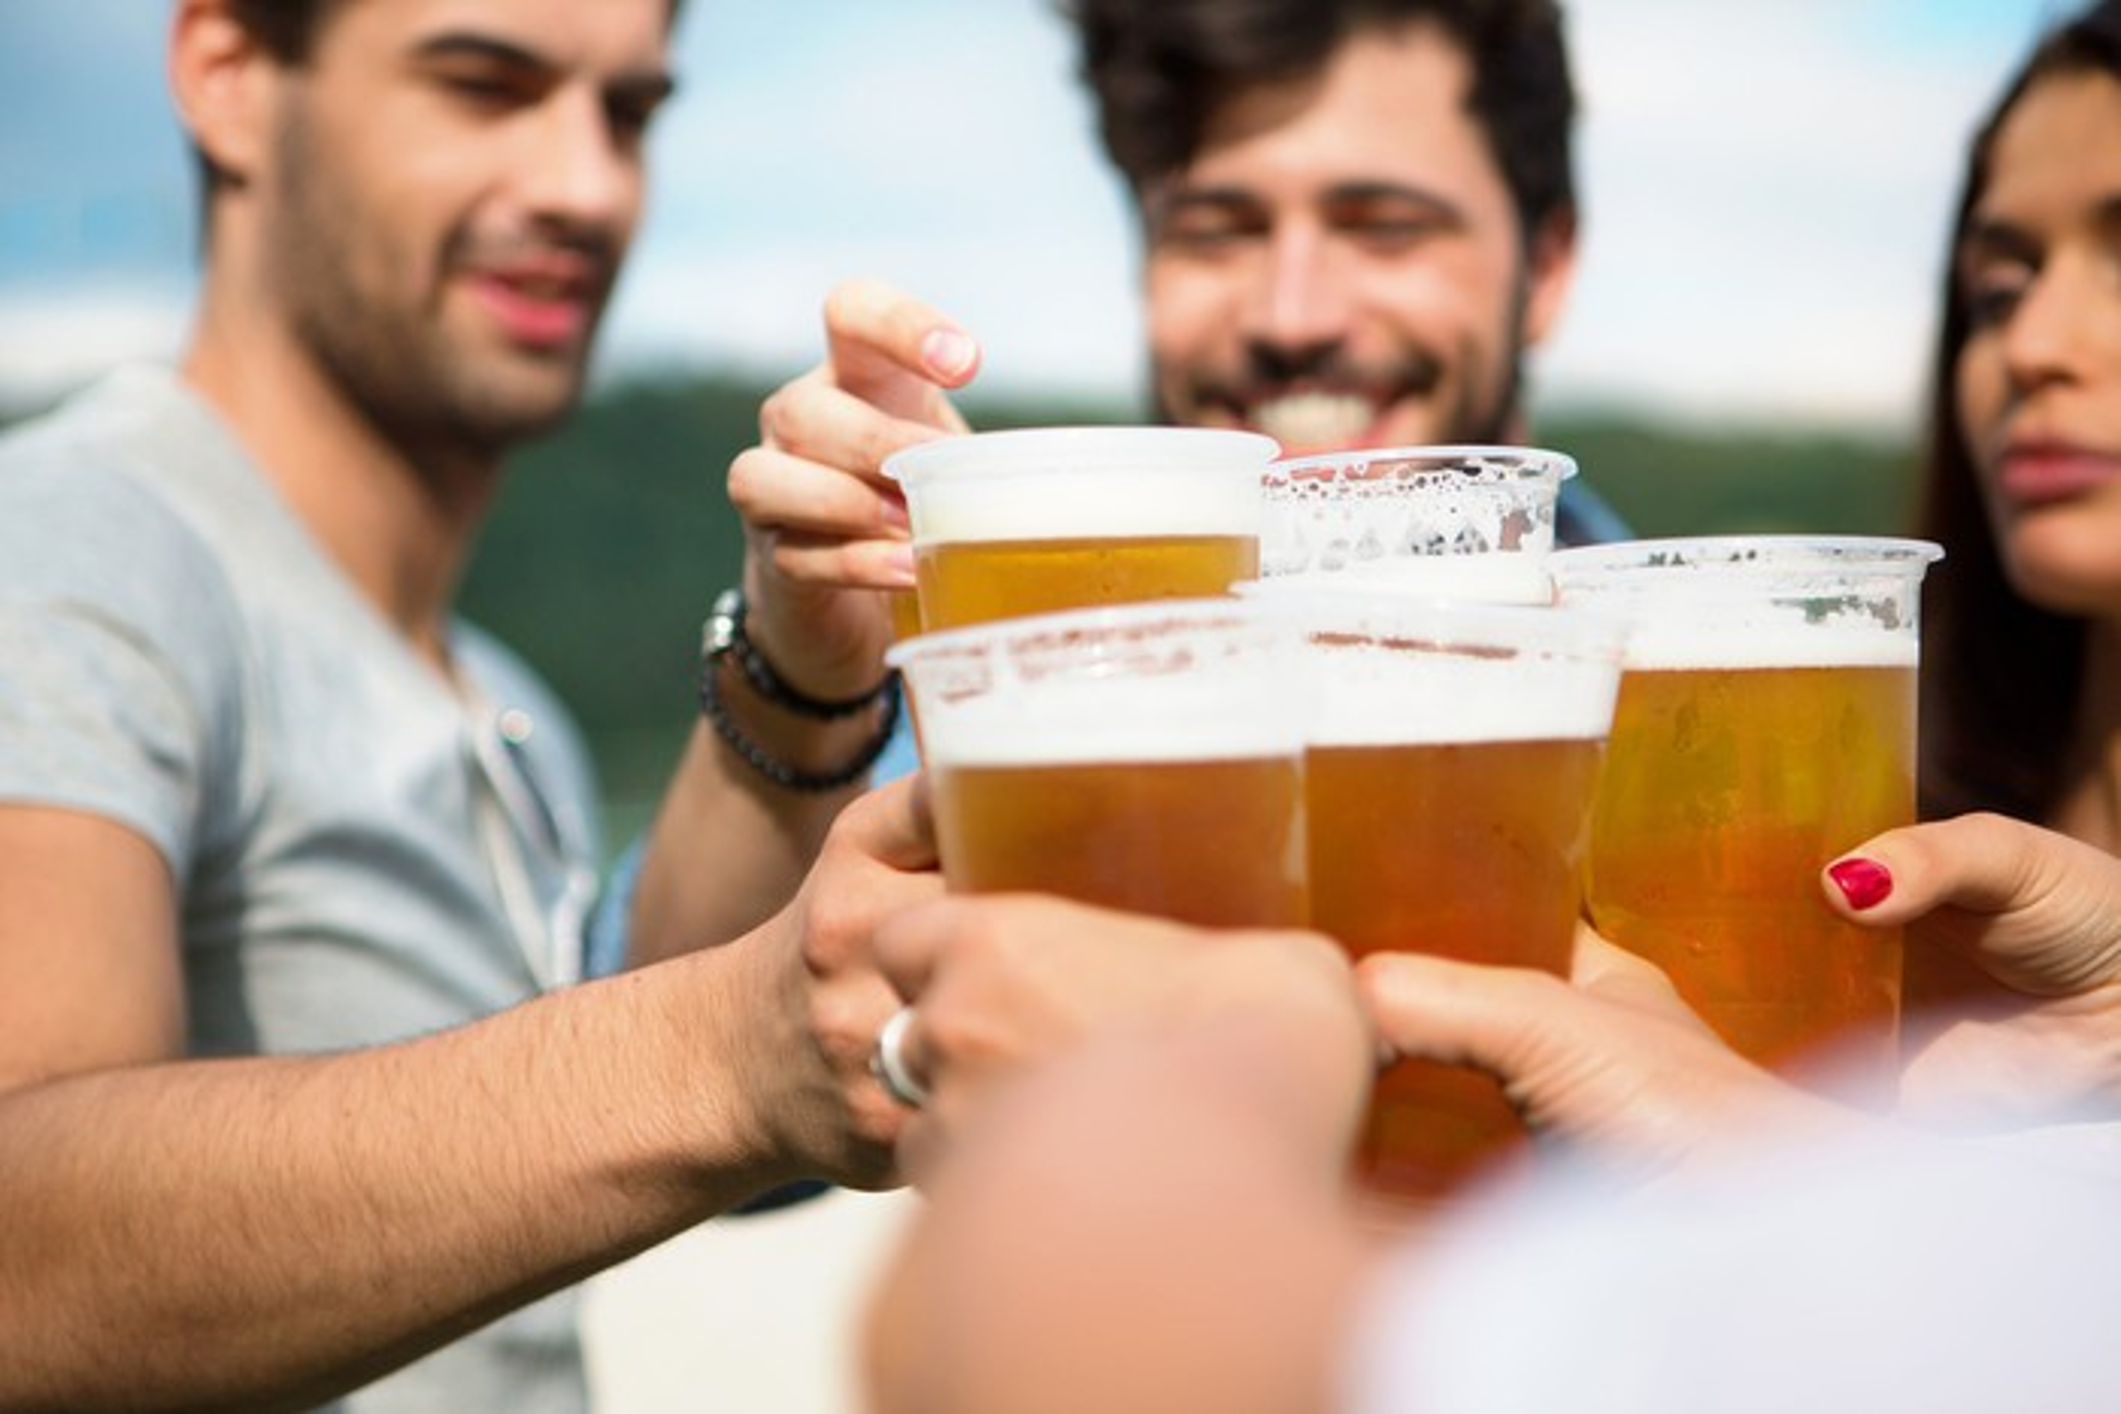 Friends drinking draft beer in summertime.